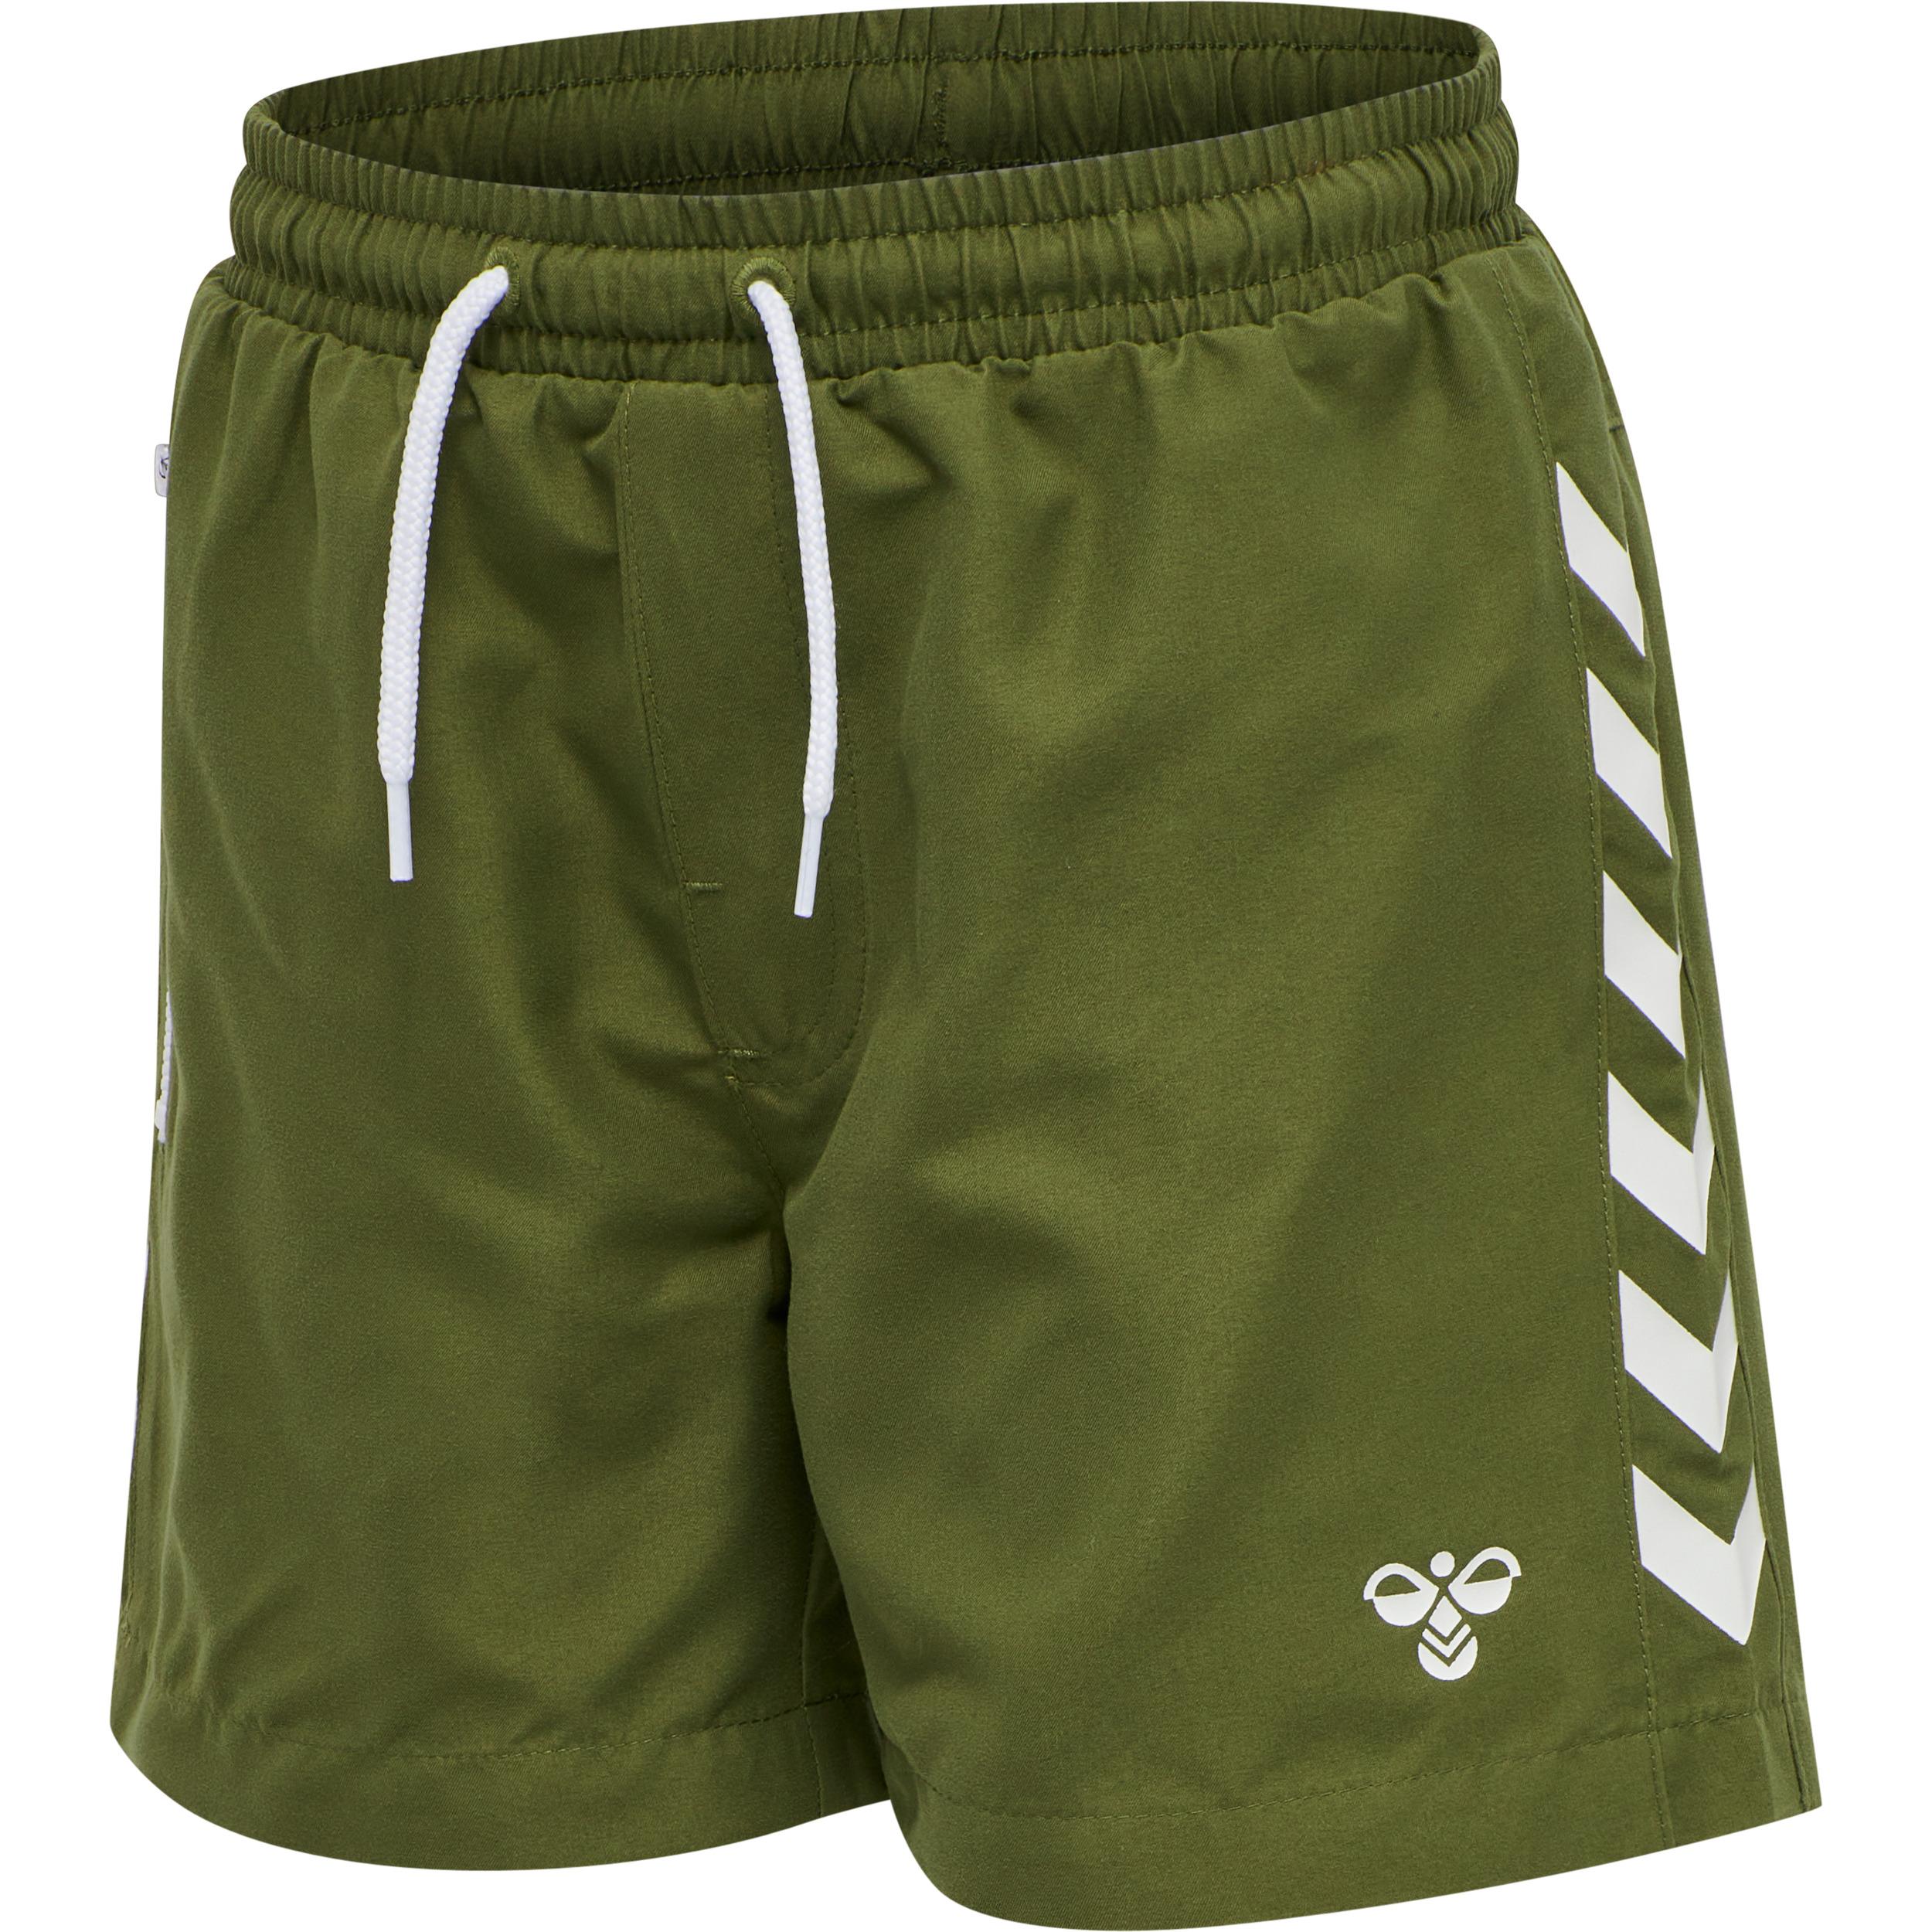 Hummel Delta Board shorts